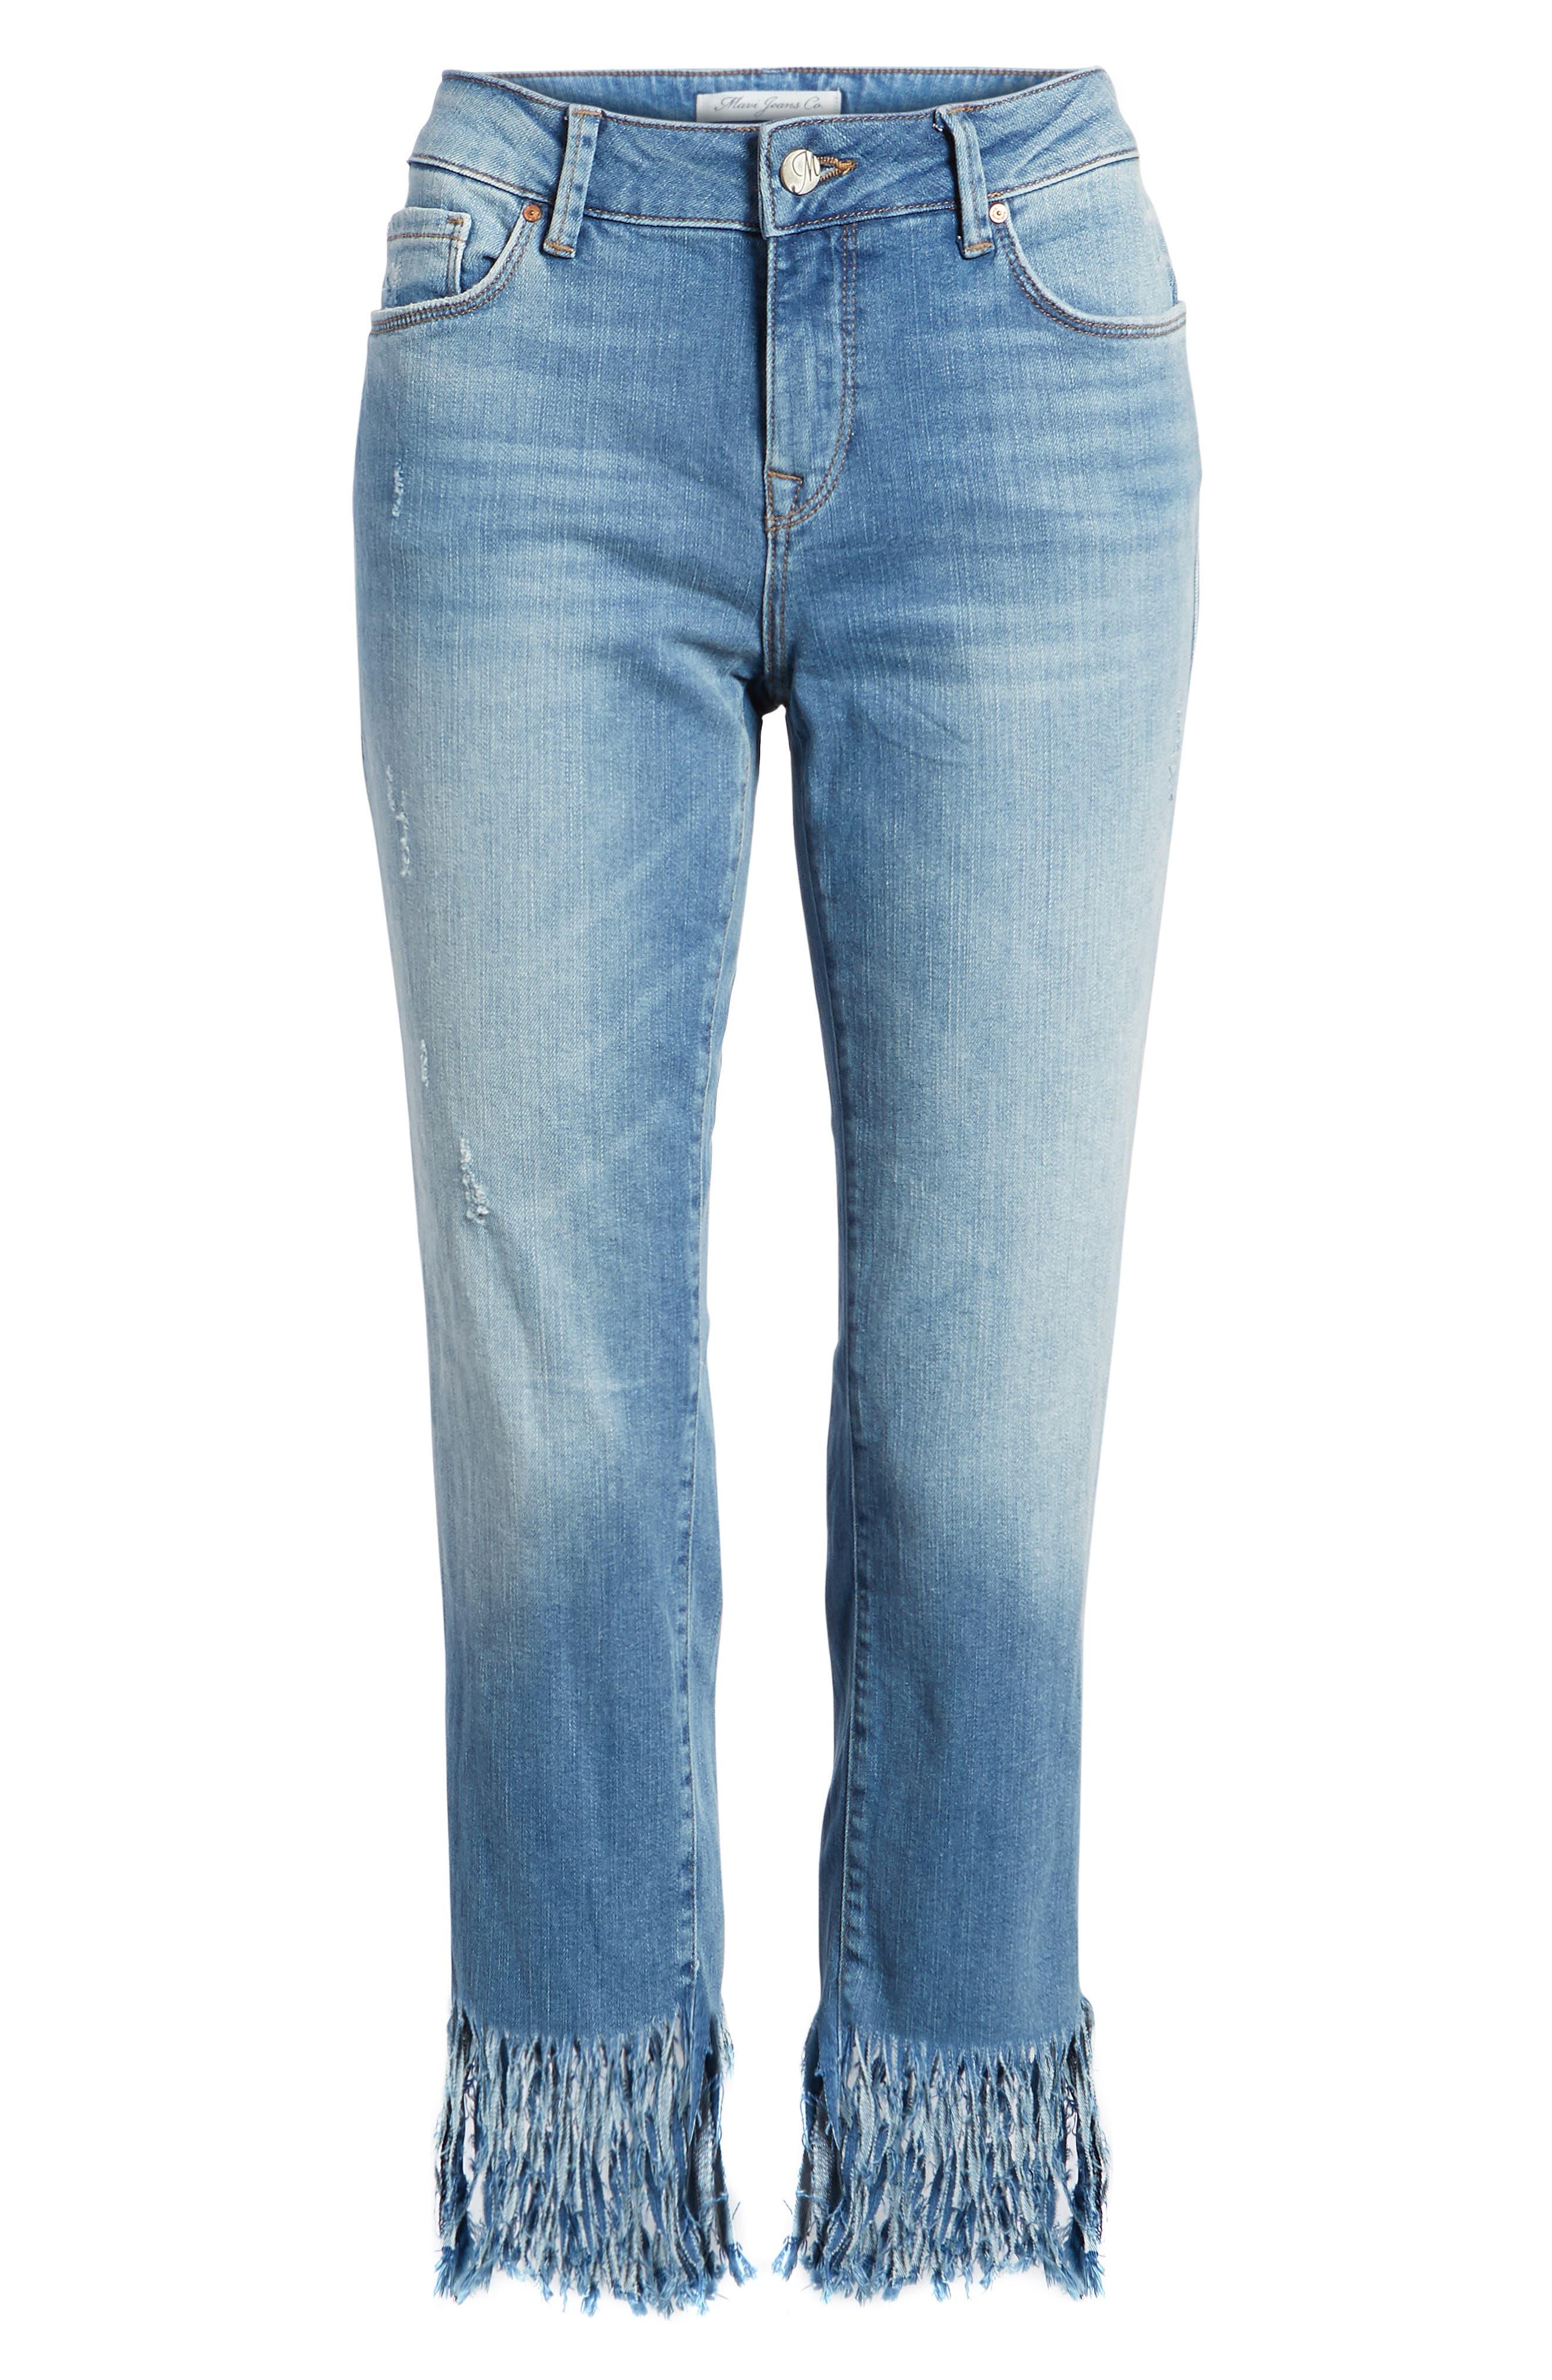 Kerry Fringe Hem Ankle Jeans,                             Alternate thumbnail 7, color,                             420